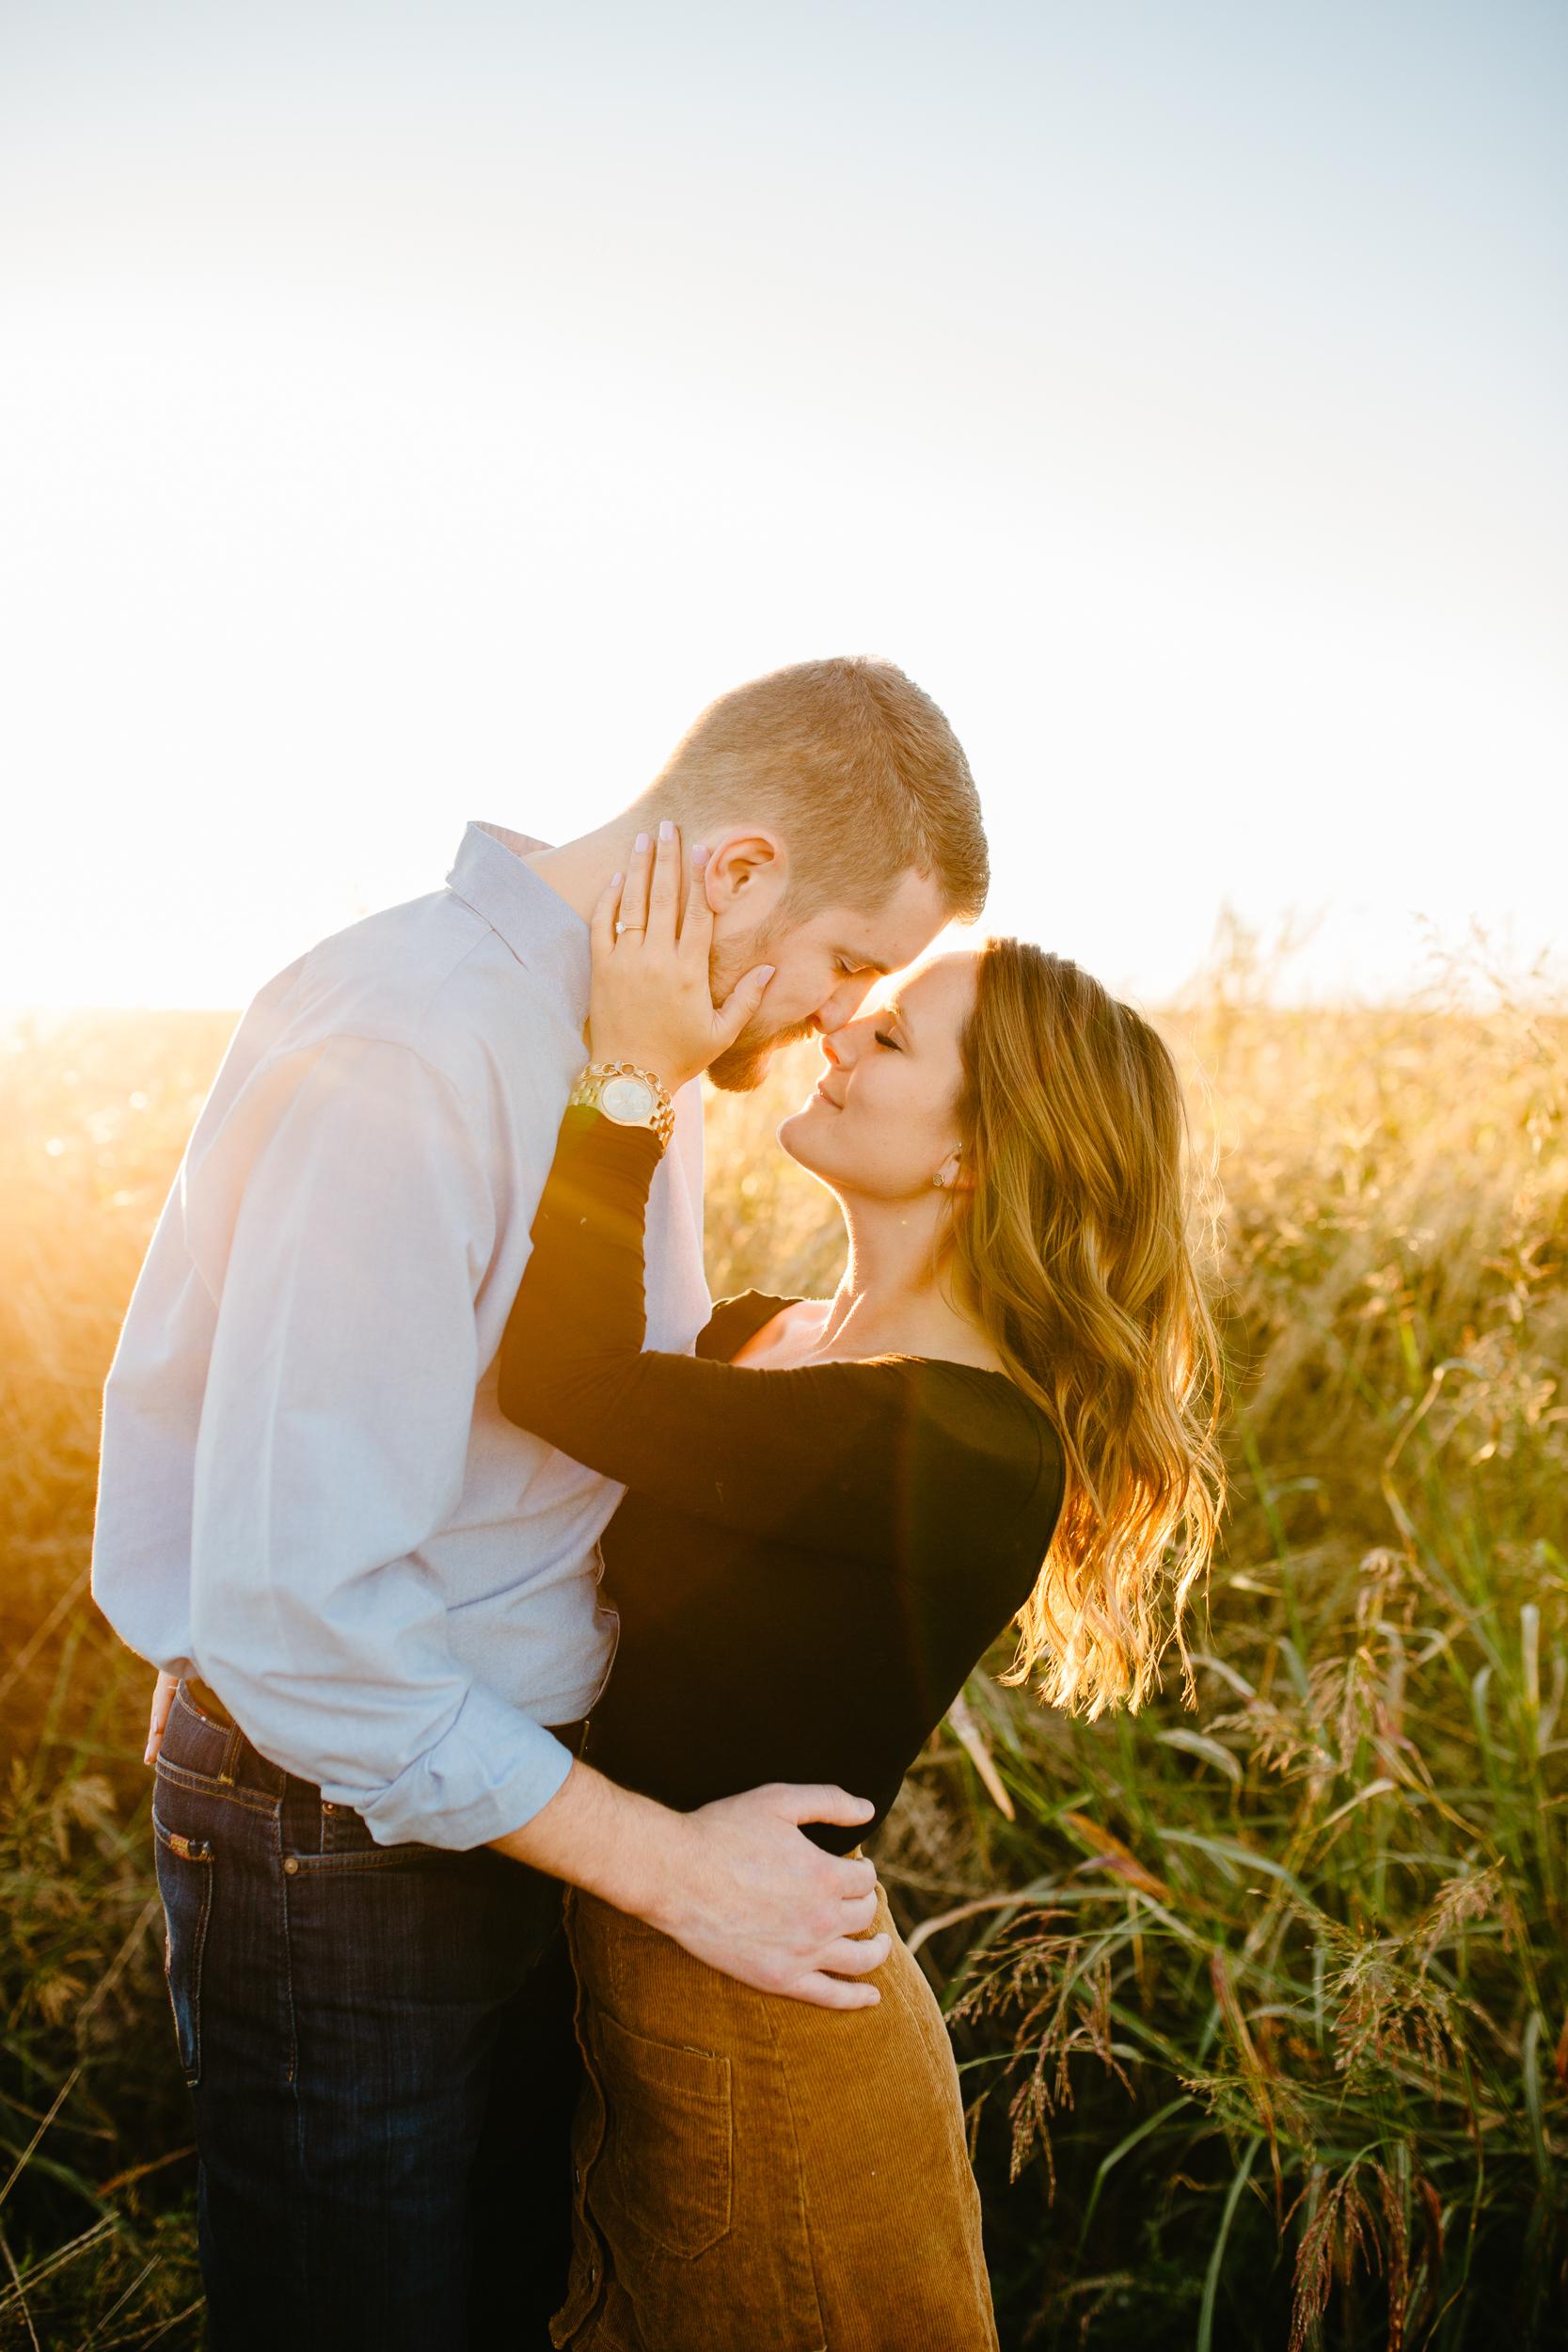 Engagement Photos-Ranalla Photo and Films-107.jpg